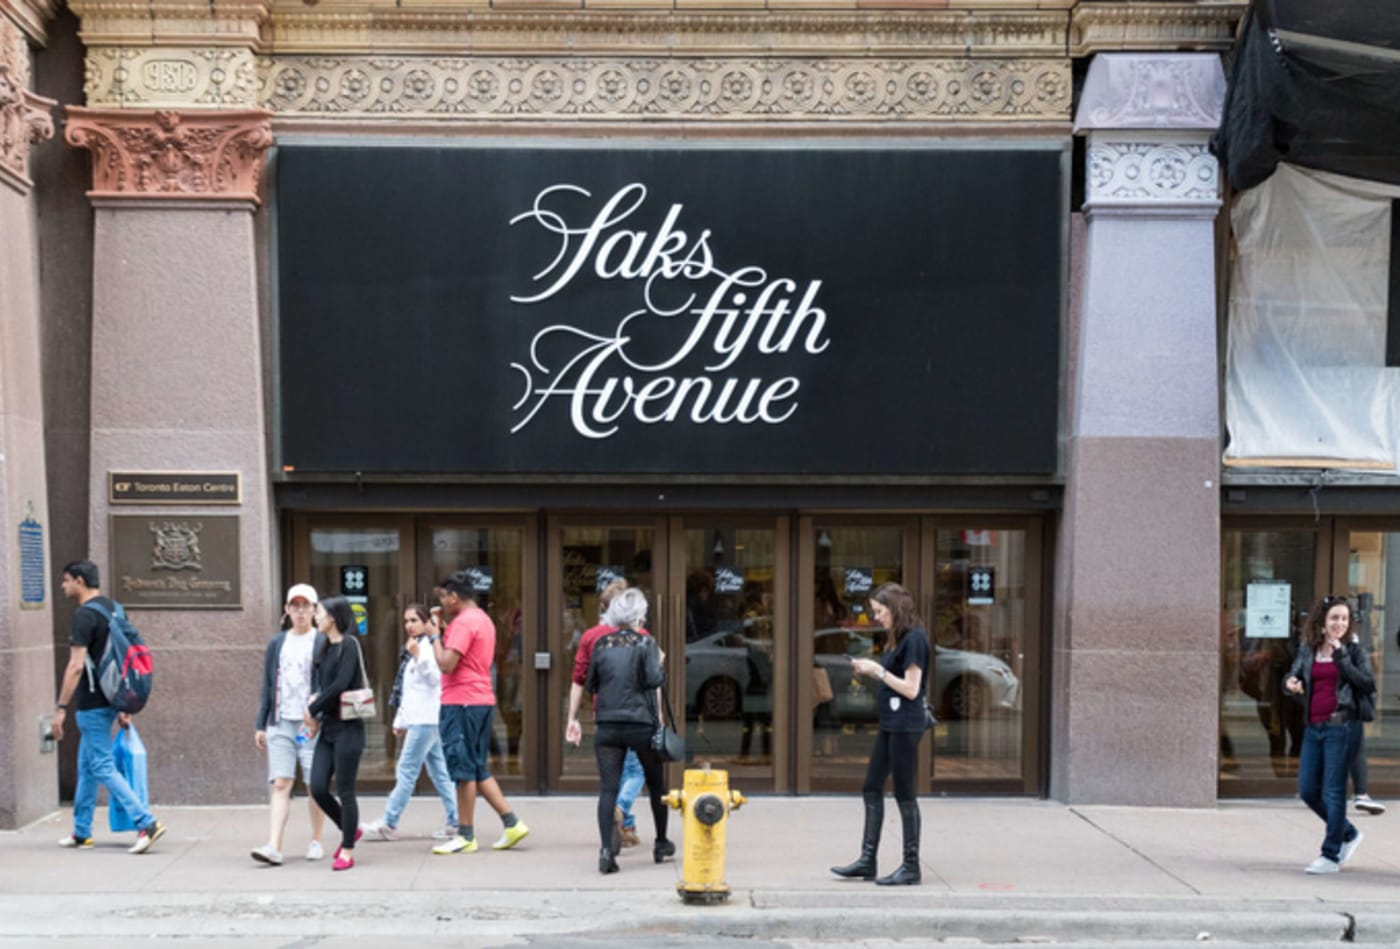 Saks Fifth Avenue sign logo